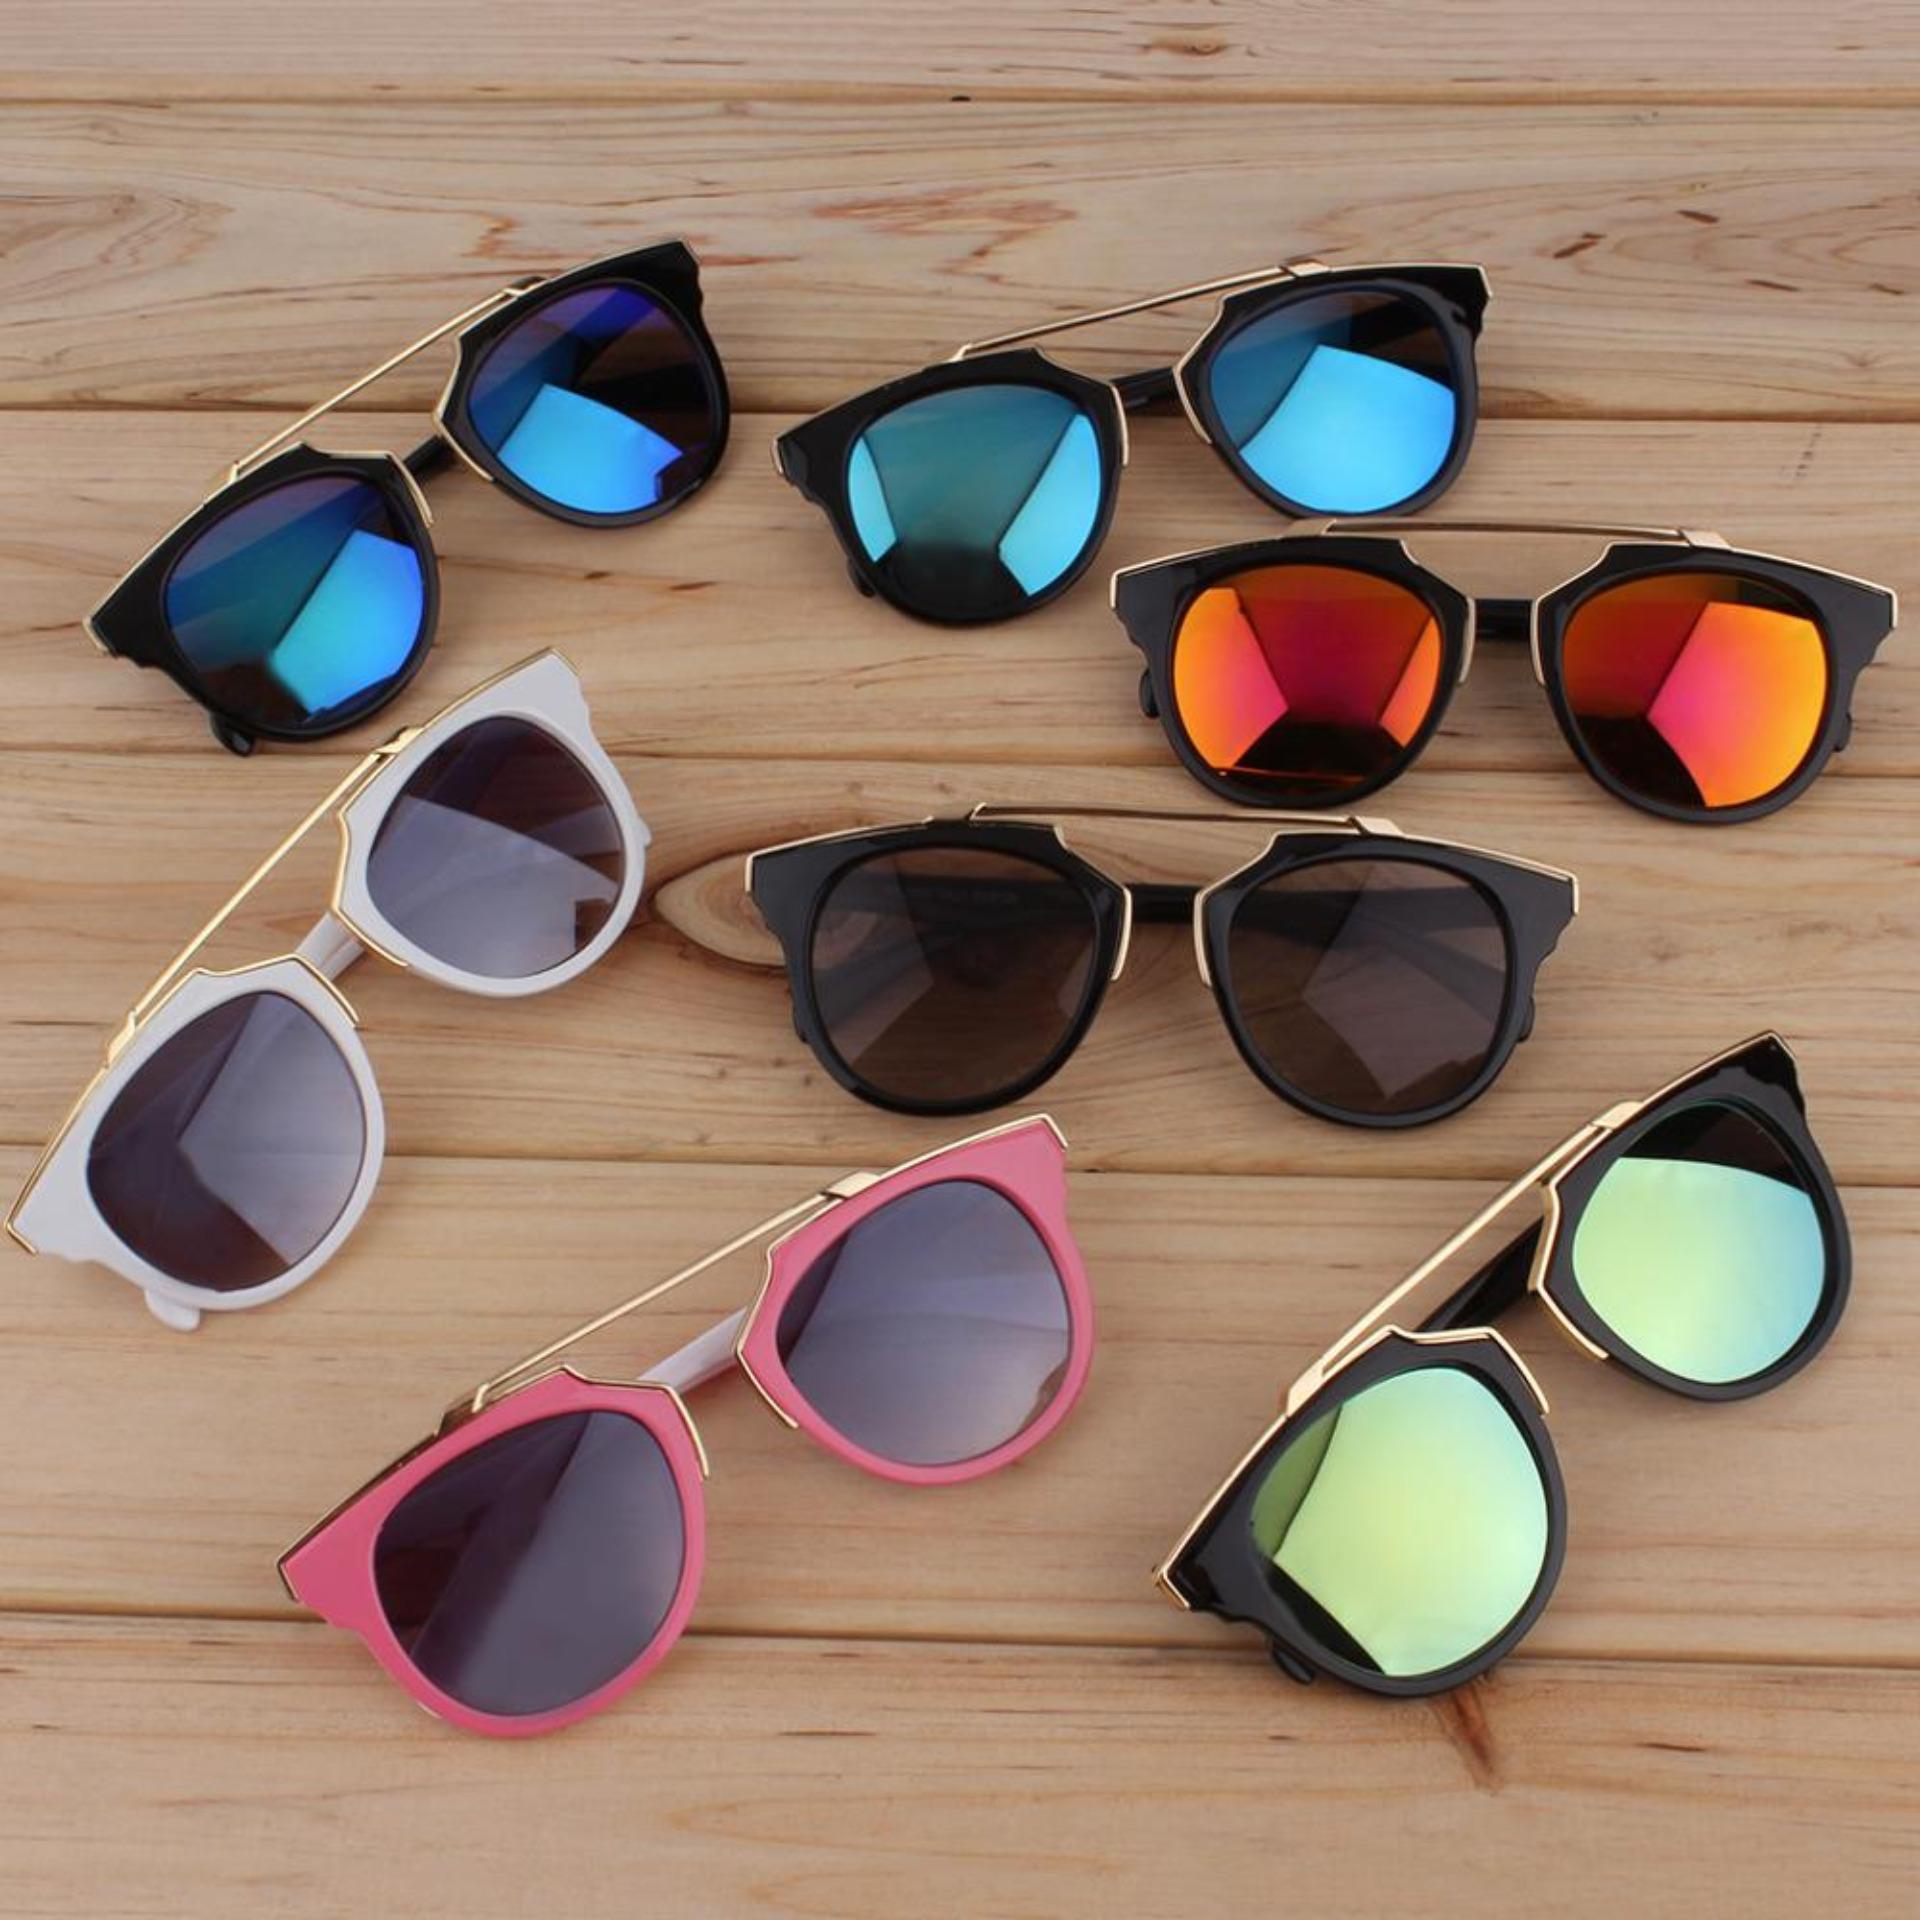 Cat Eye Retro Sunglasses -Kacamata Wanita - Hitam - CHF 008 Green .